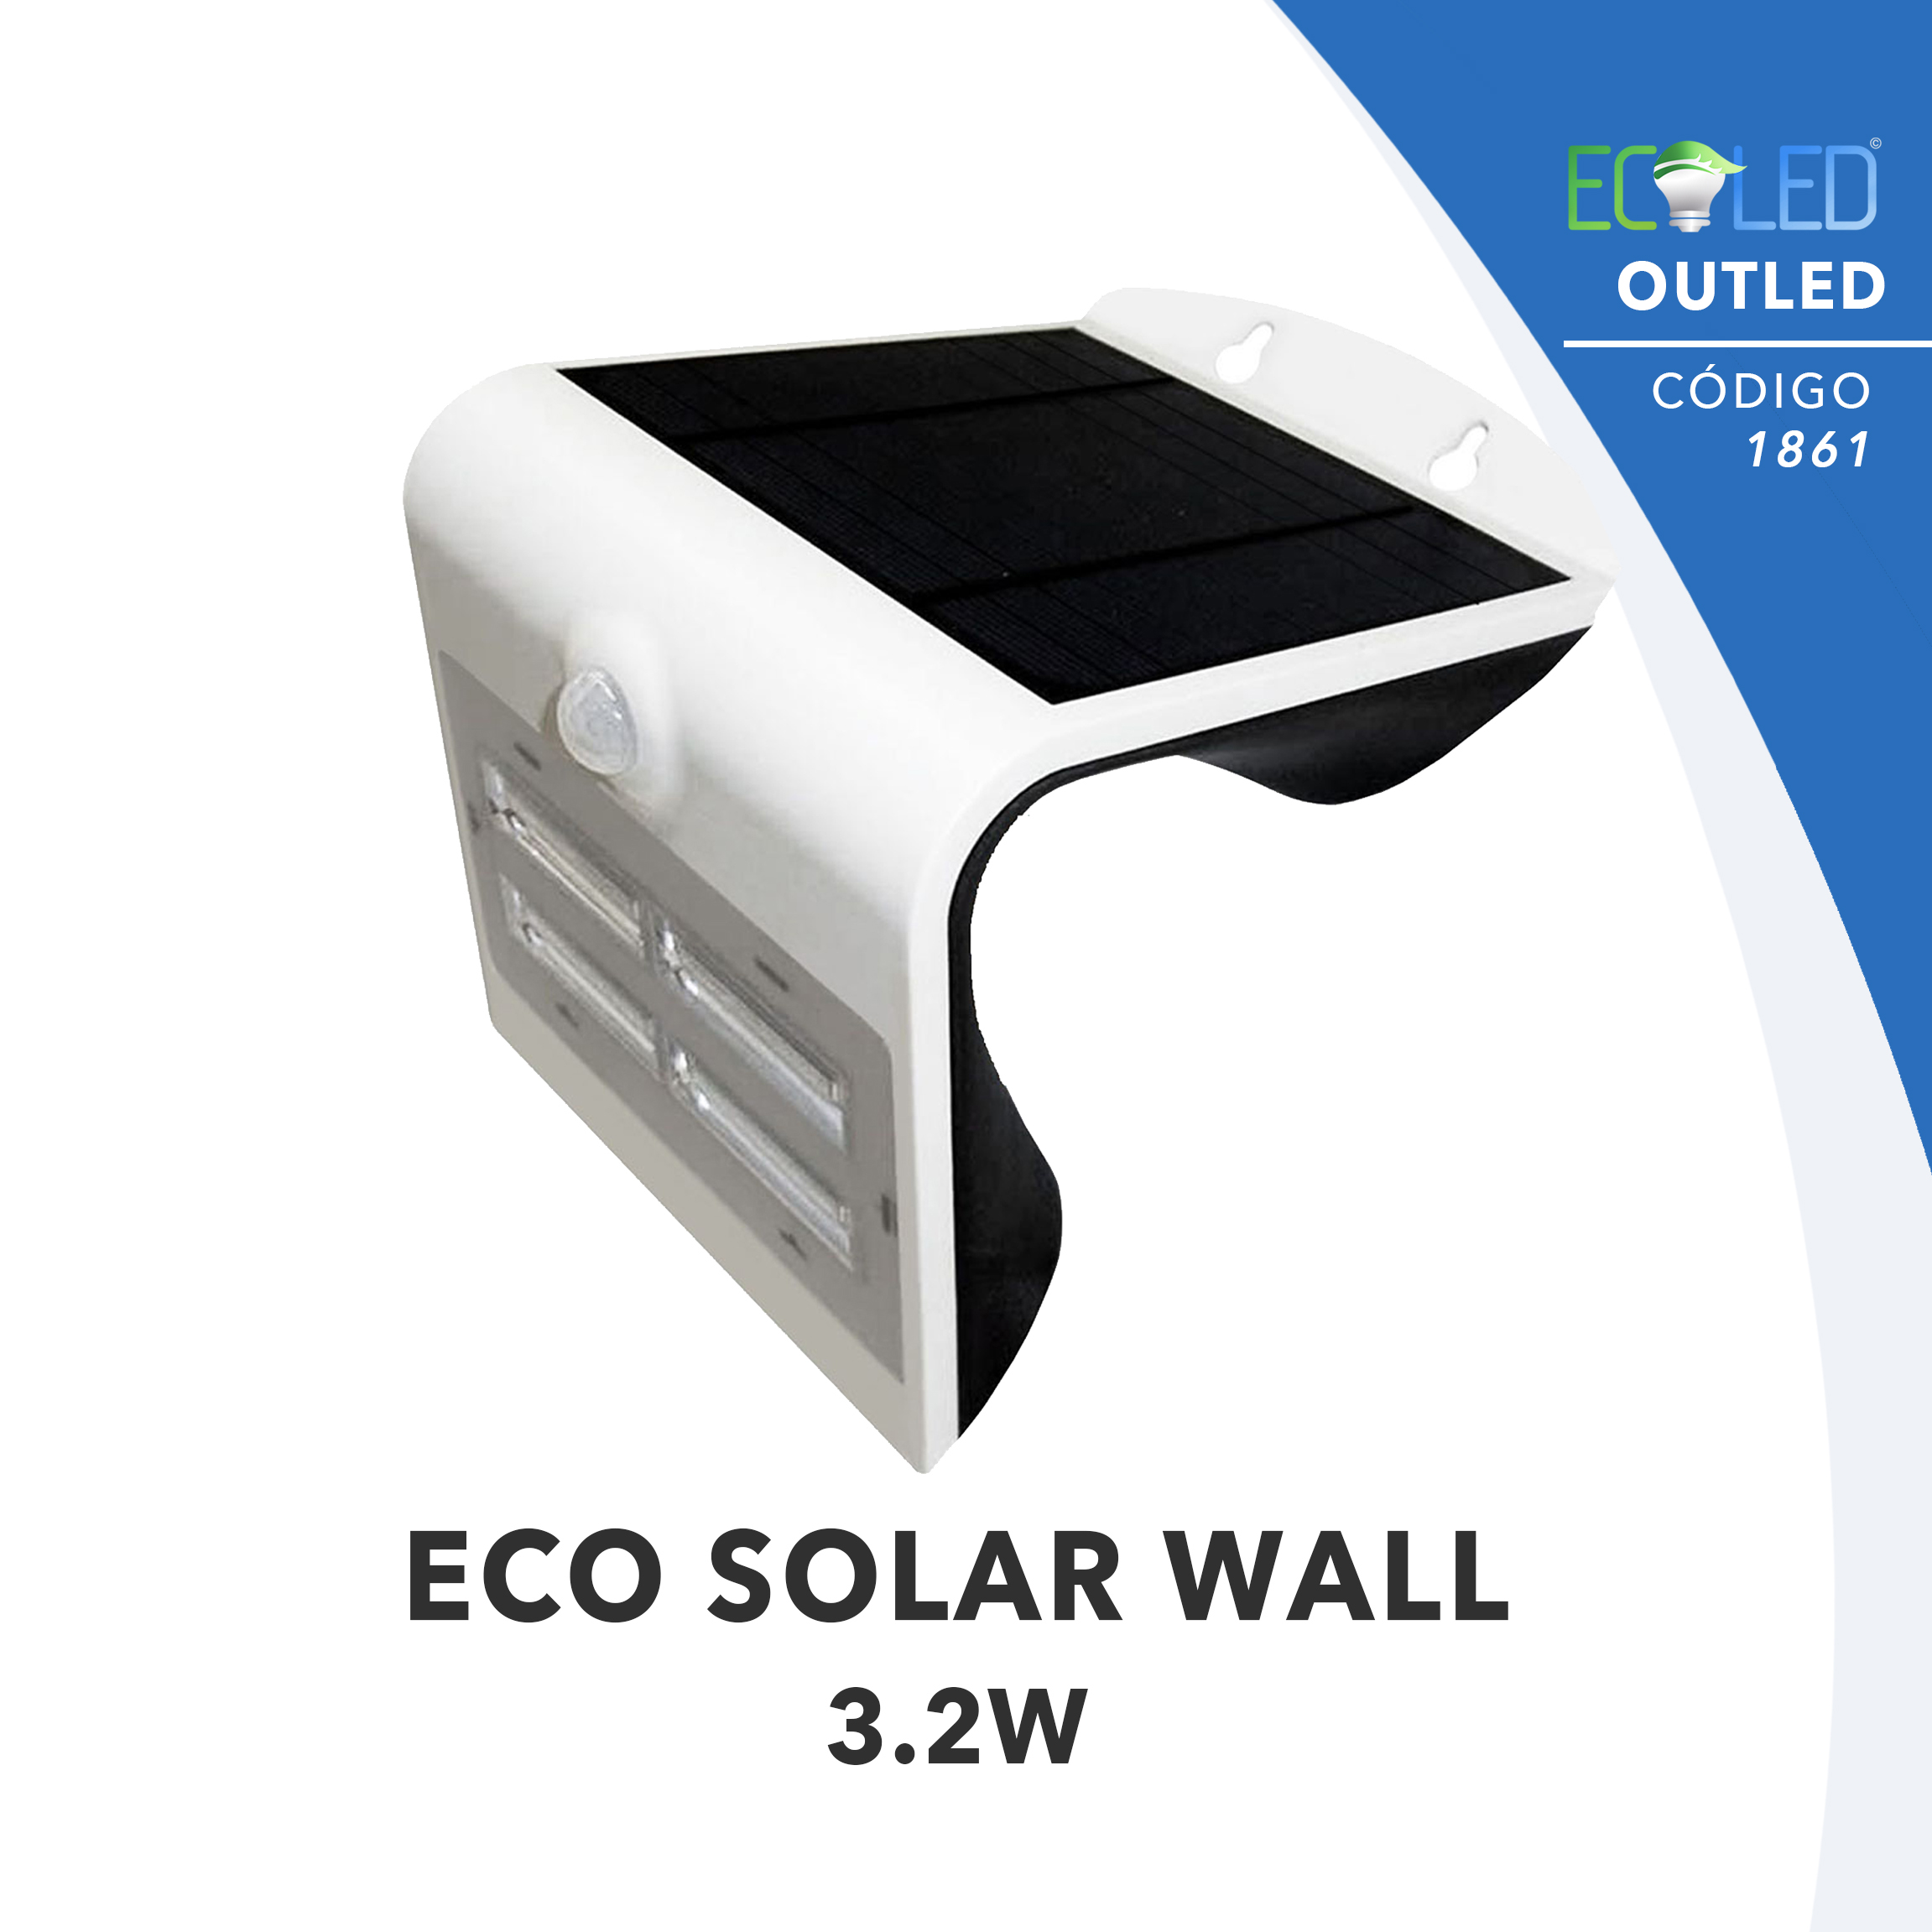 1861 · ECO SOLAR WALL-3.2W